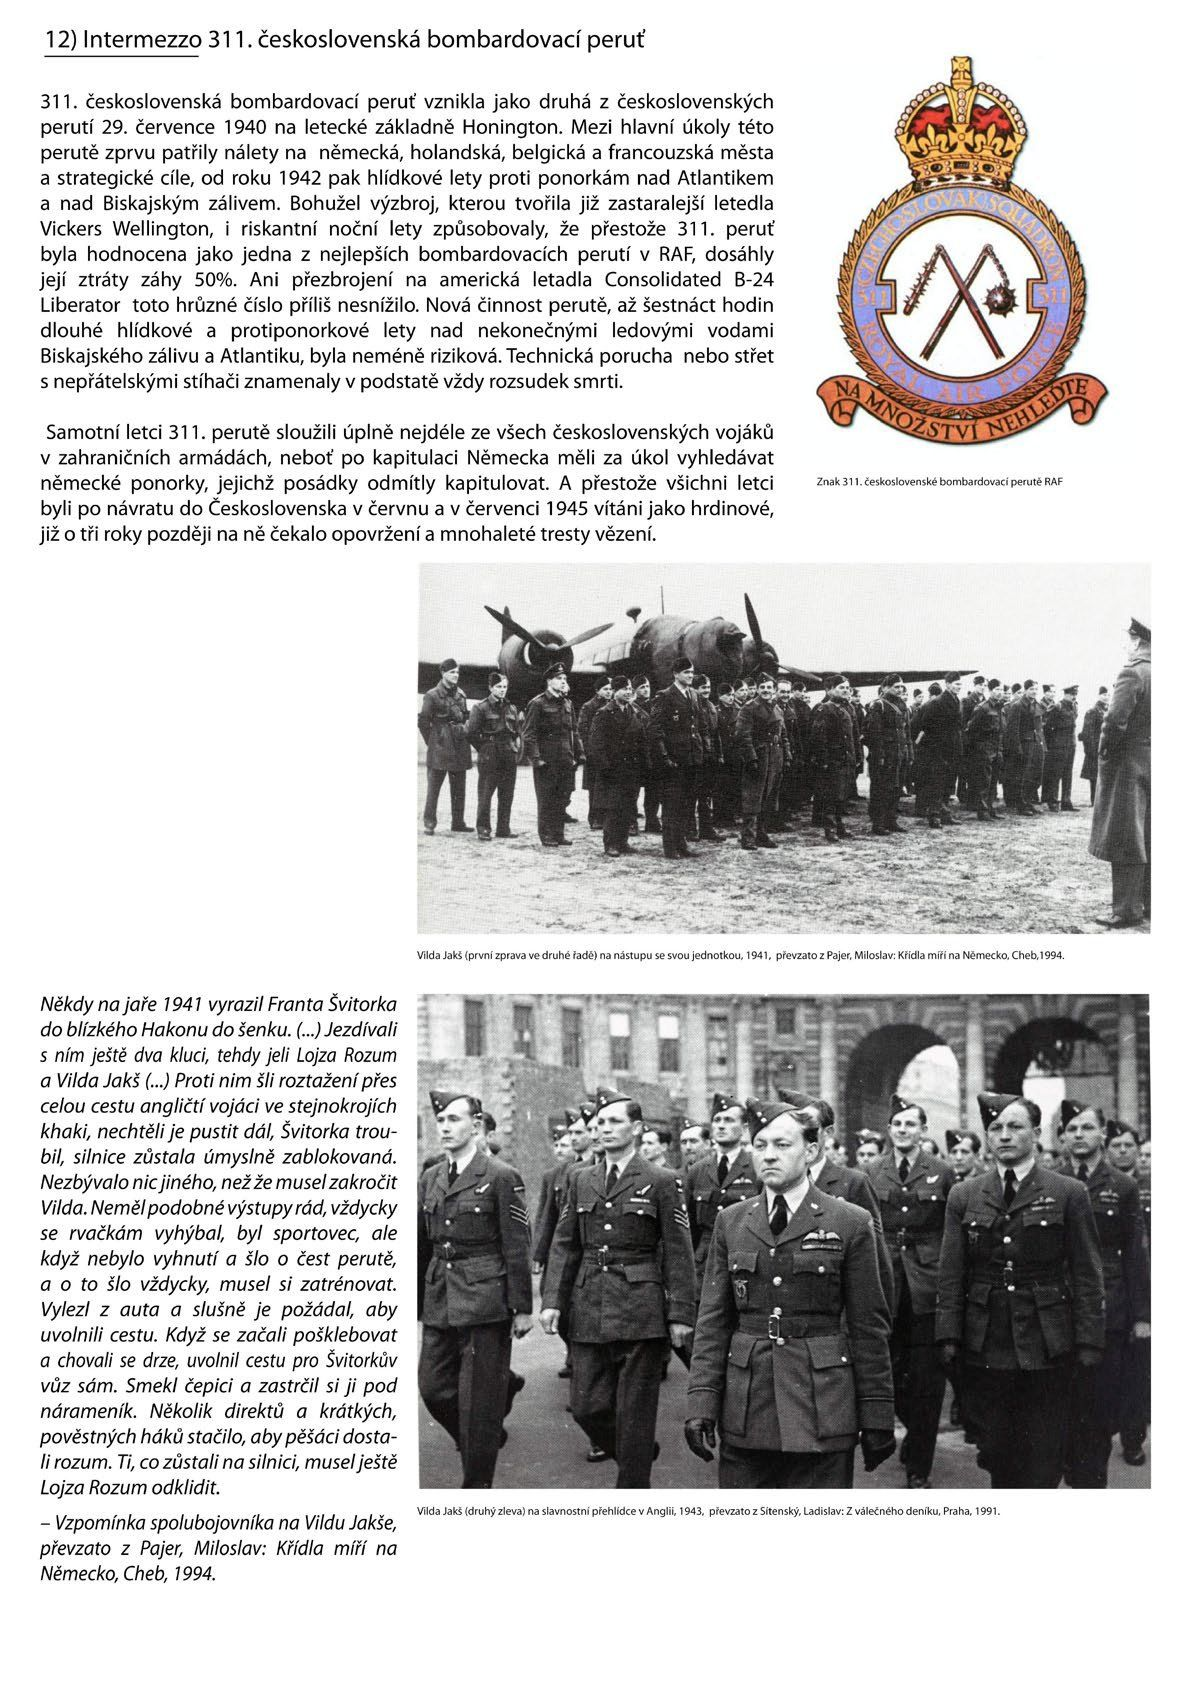 Výstava Vilda Jakš - 311. československá bombardovací peruť